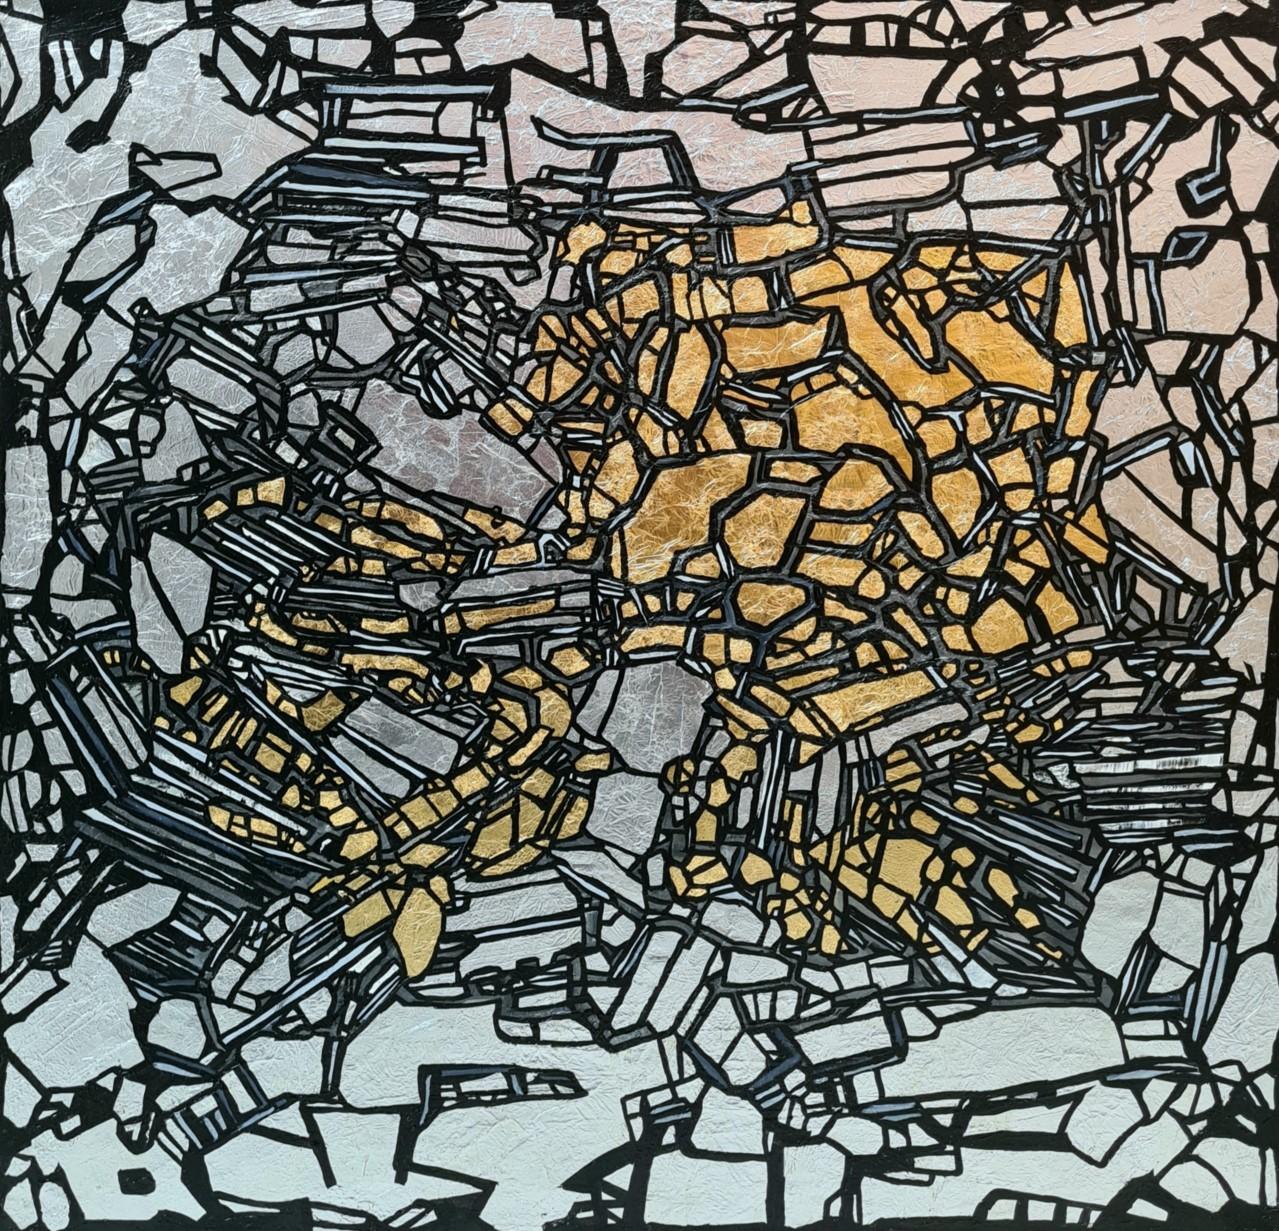 Tectonicus V<br></br>Size: 36 x 36 inches<br></br>Medium: Silver Leaf, Gold leaf & Acrylic on Canvas